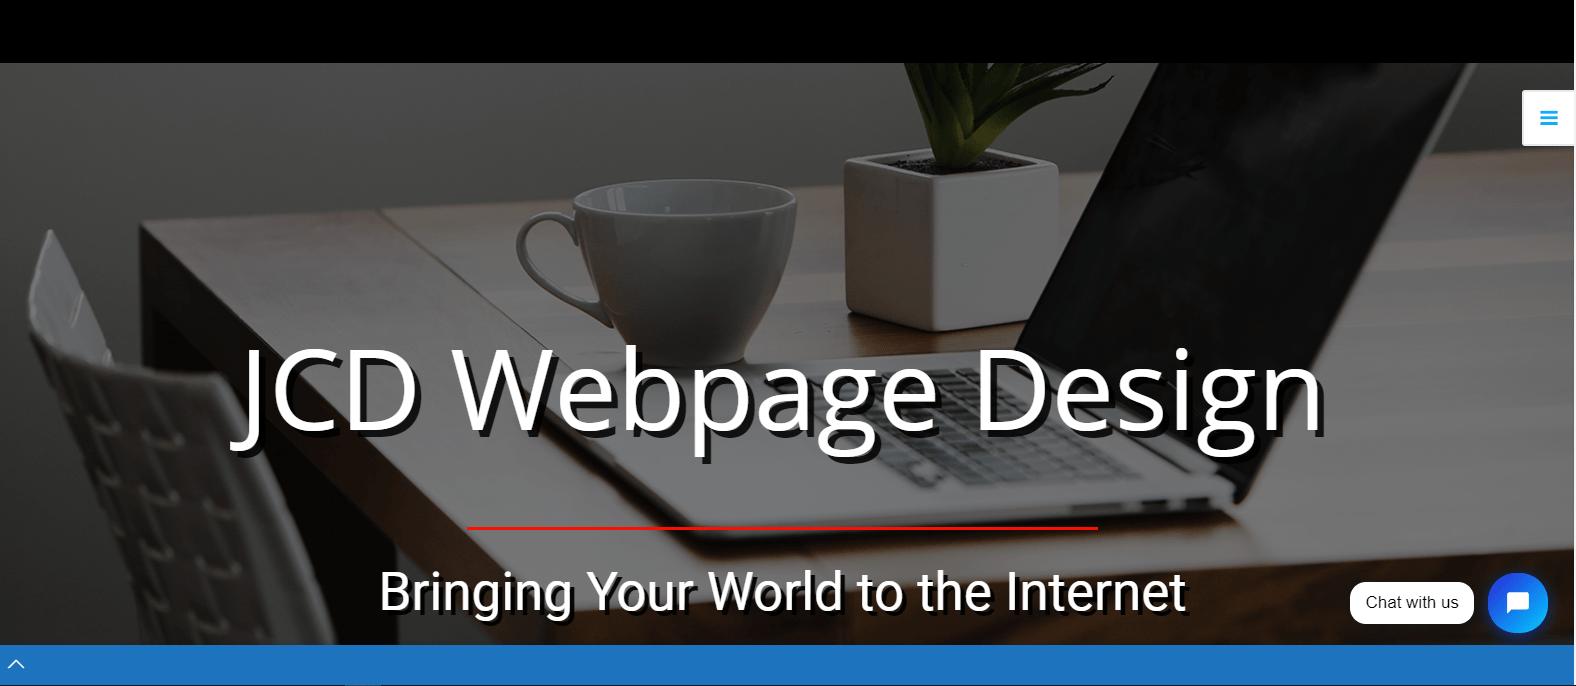 JCD Webpage Design